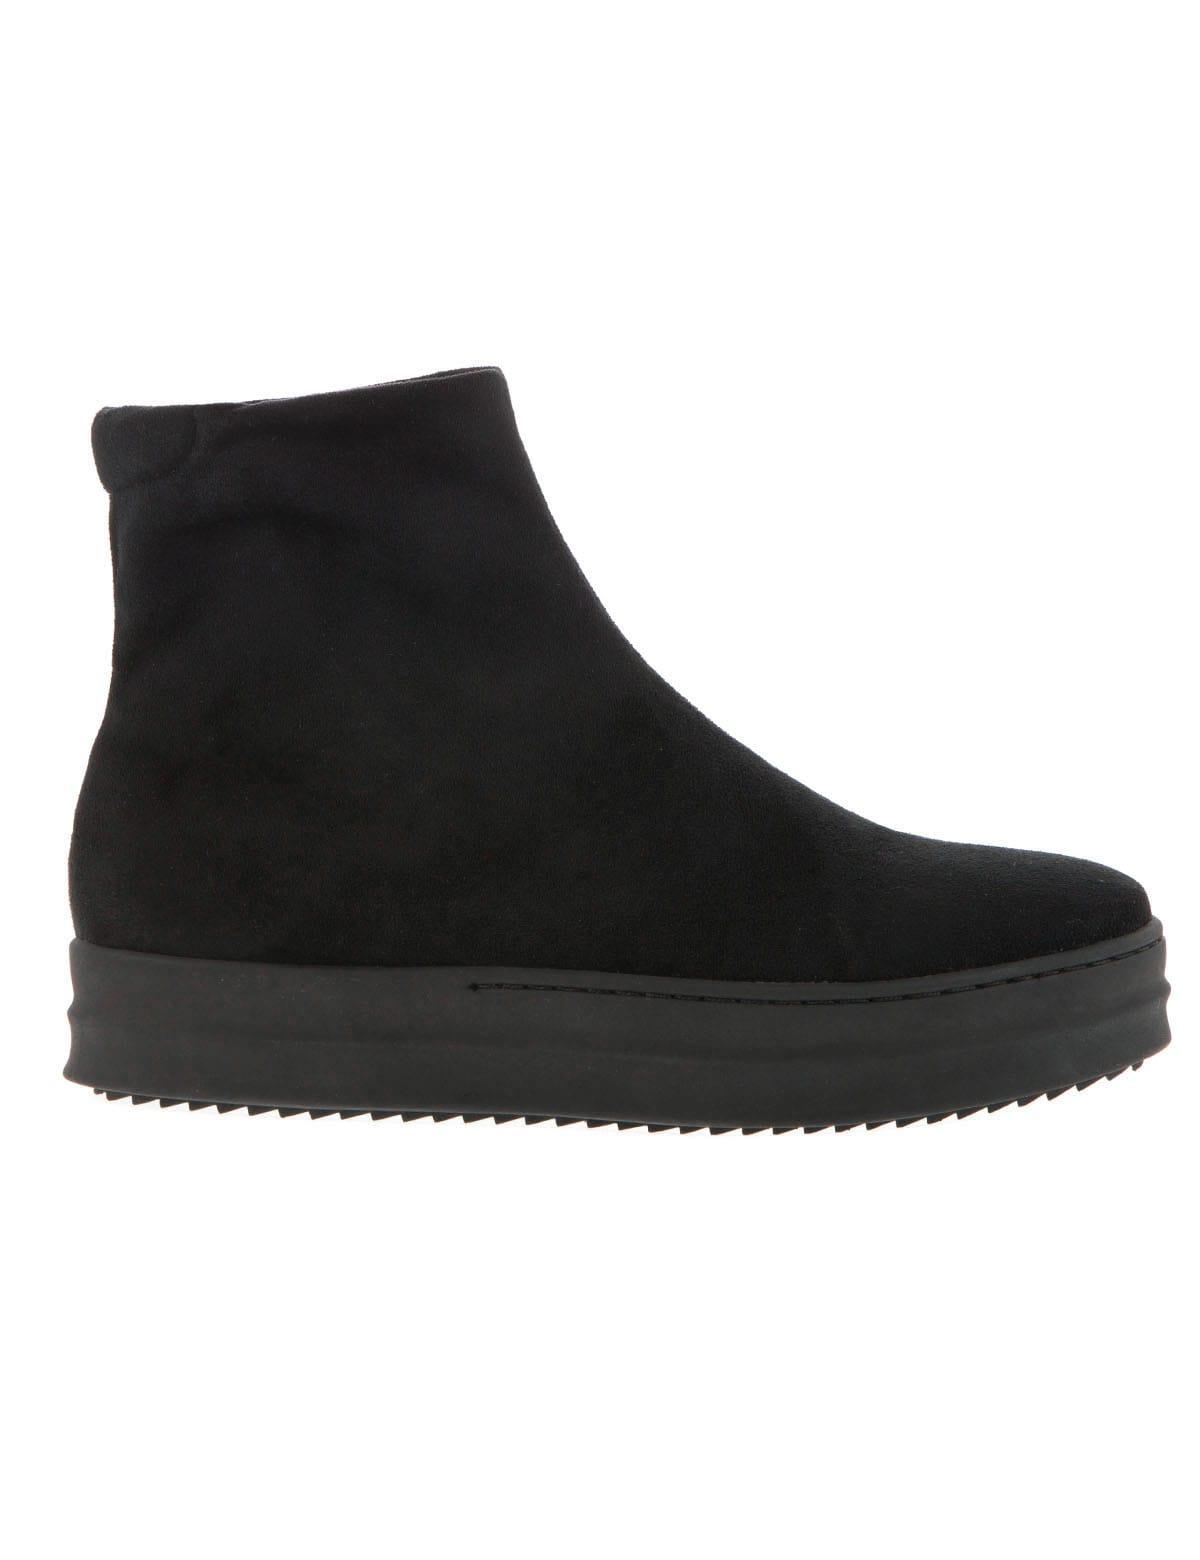 Lara Black Suede χειμερινη συλλογη   sneakers